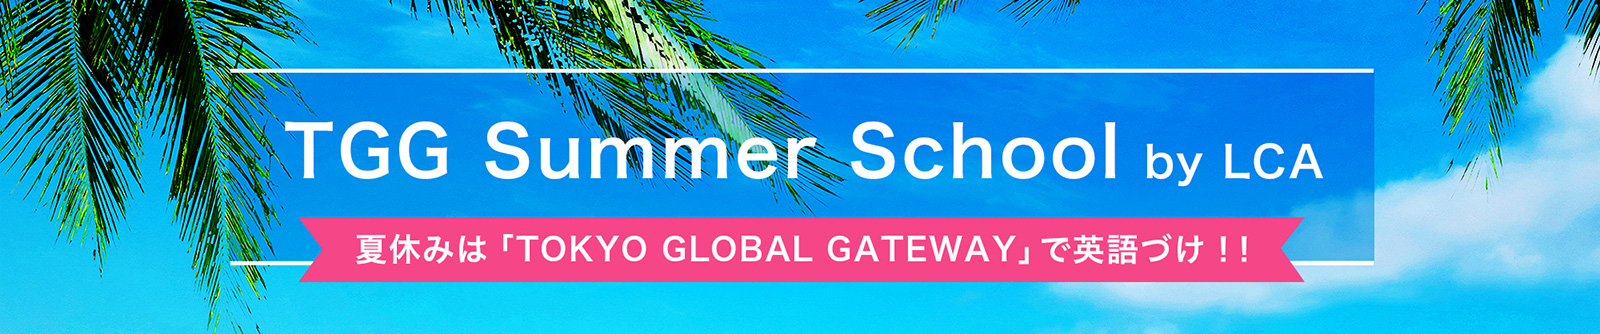 TGG Summer School by LCA 夏休みは「TOKYO GLOBAL GATEWAY」で英語づけ!!